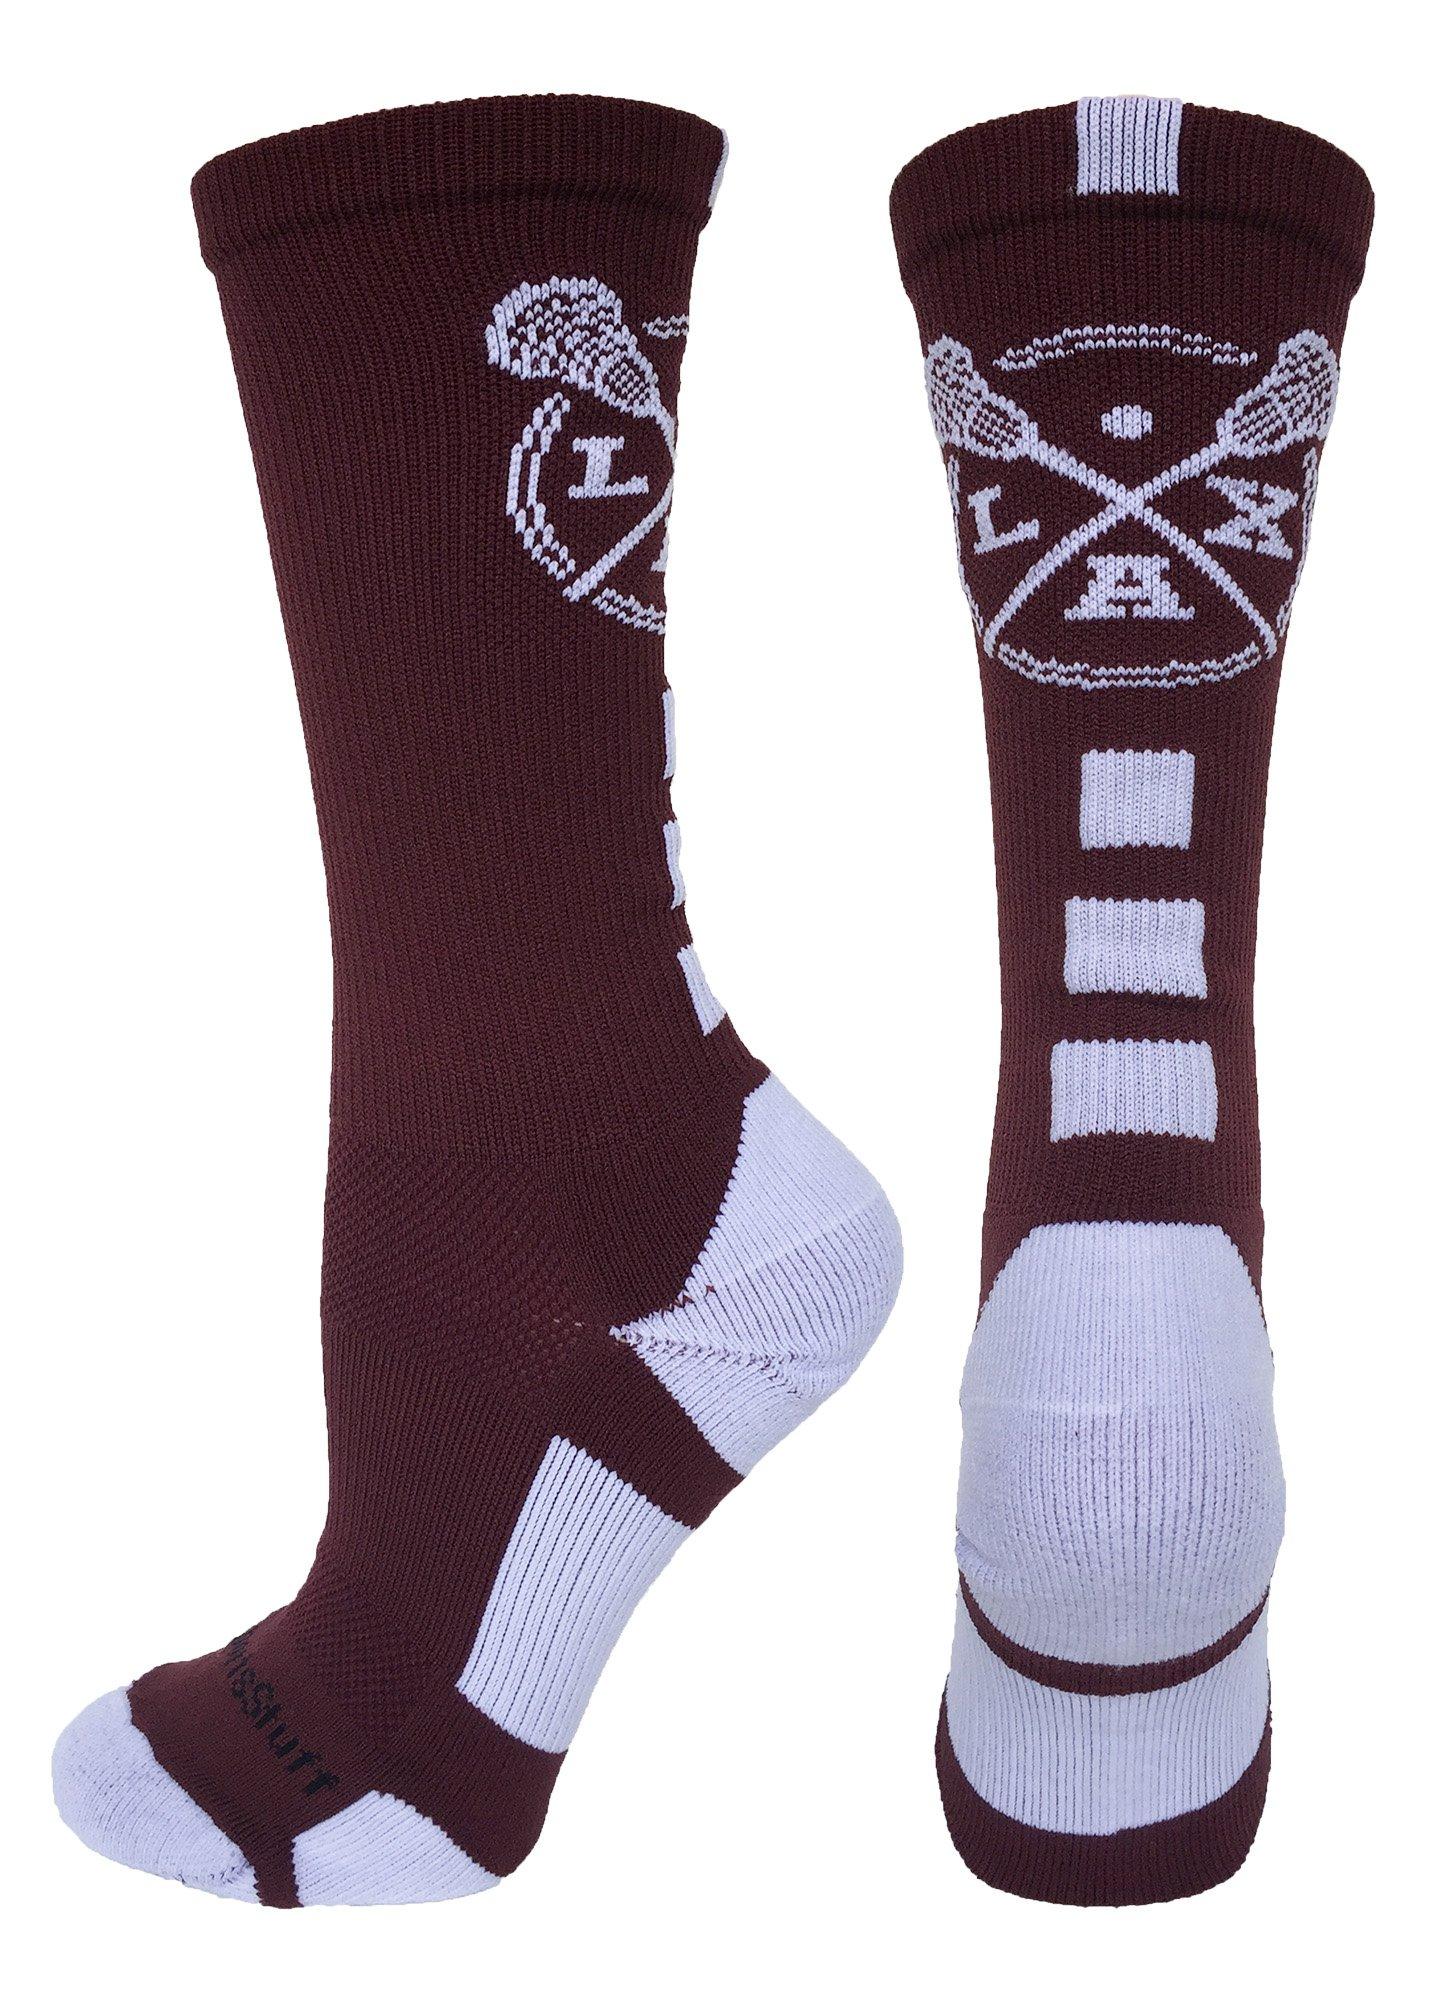 LAX Lacrosse Socks with Lacrosse Sticks Athletic Crew Socks (Maroon/White, Medium) by MadSportsStuff